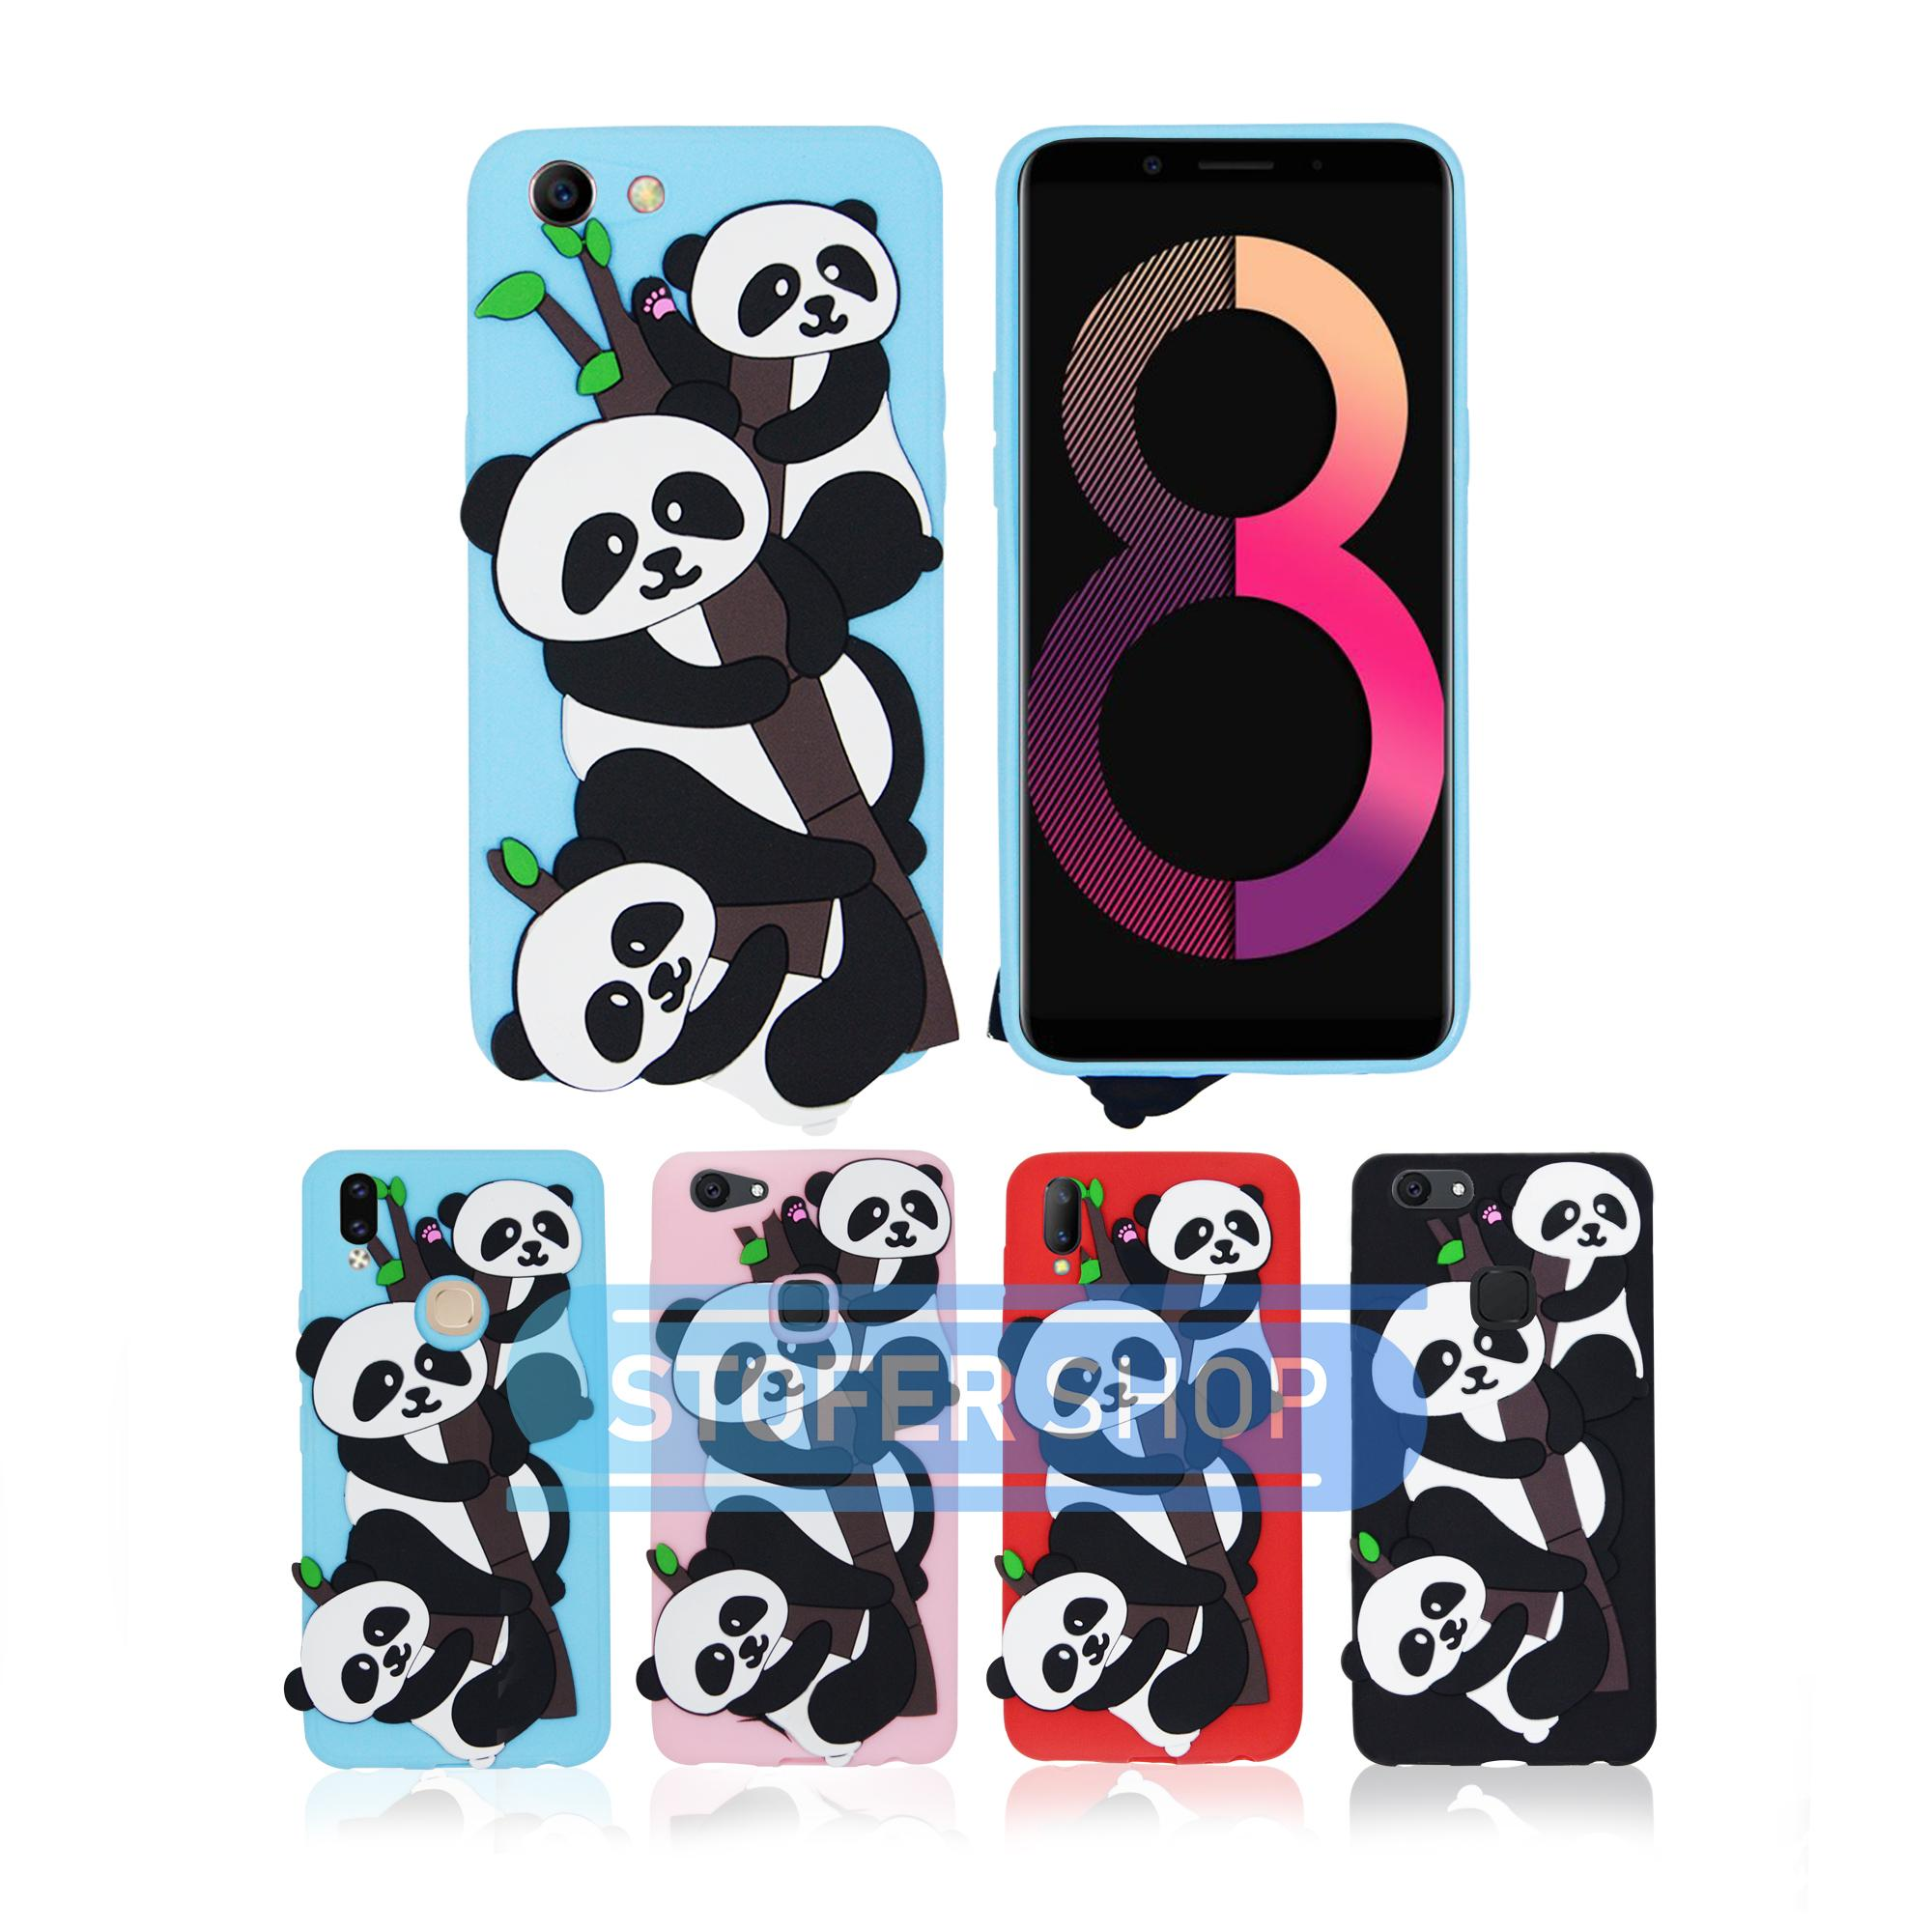 Rp 20.000. Case Boneka PANDA Oppo A83 Casing Karakter / Softcase/ Silicon / 3D / 4D Lucu Character CartoonIDR20000